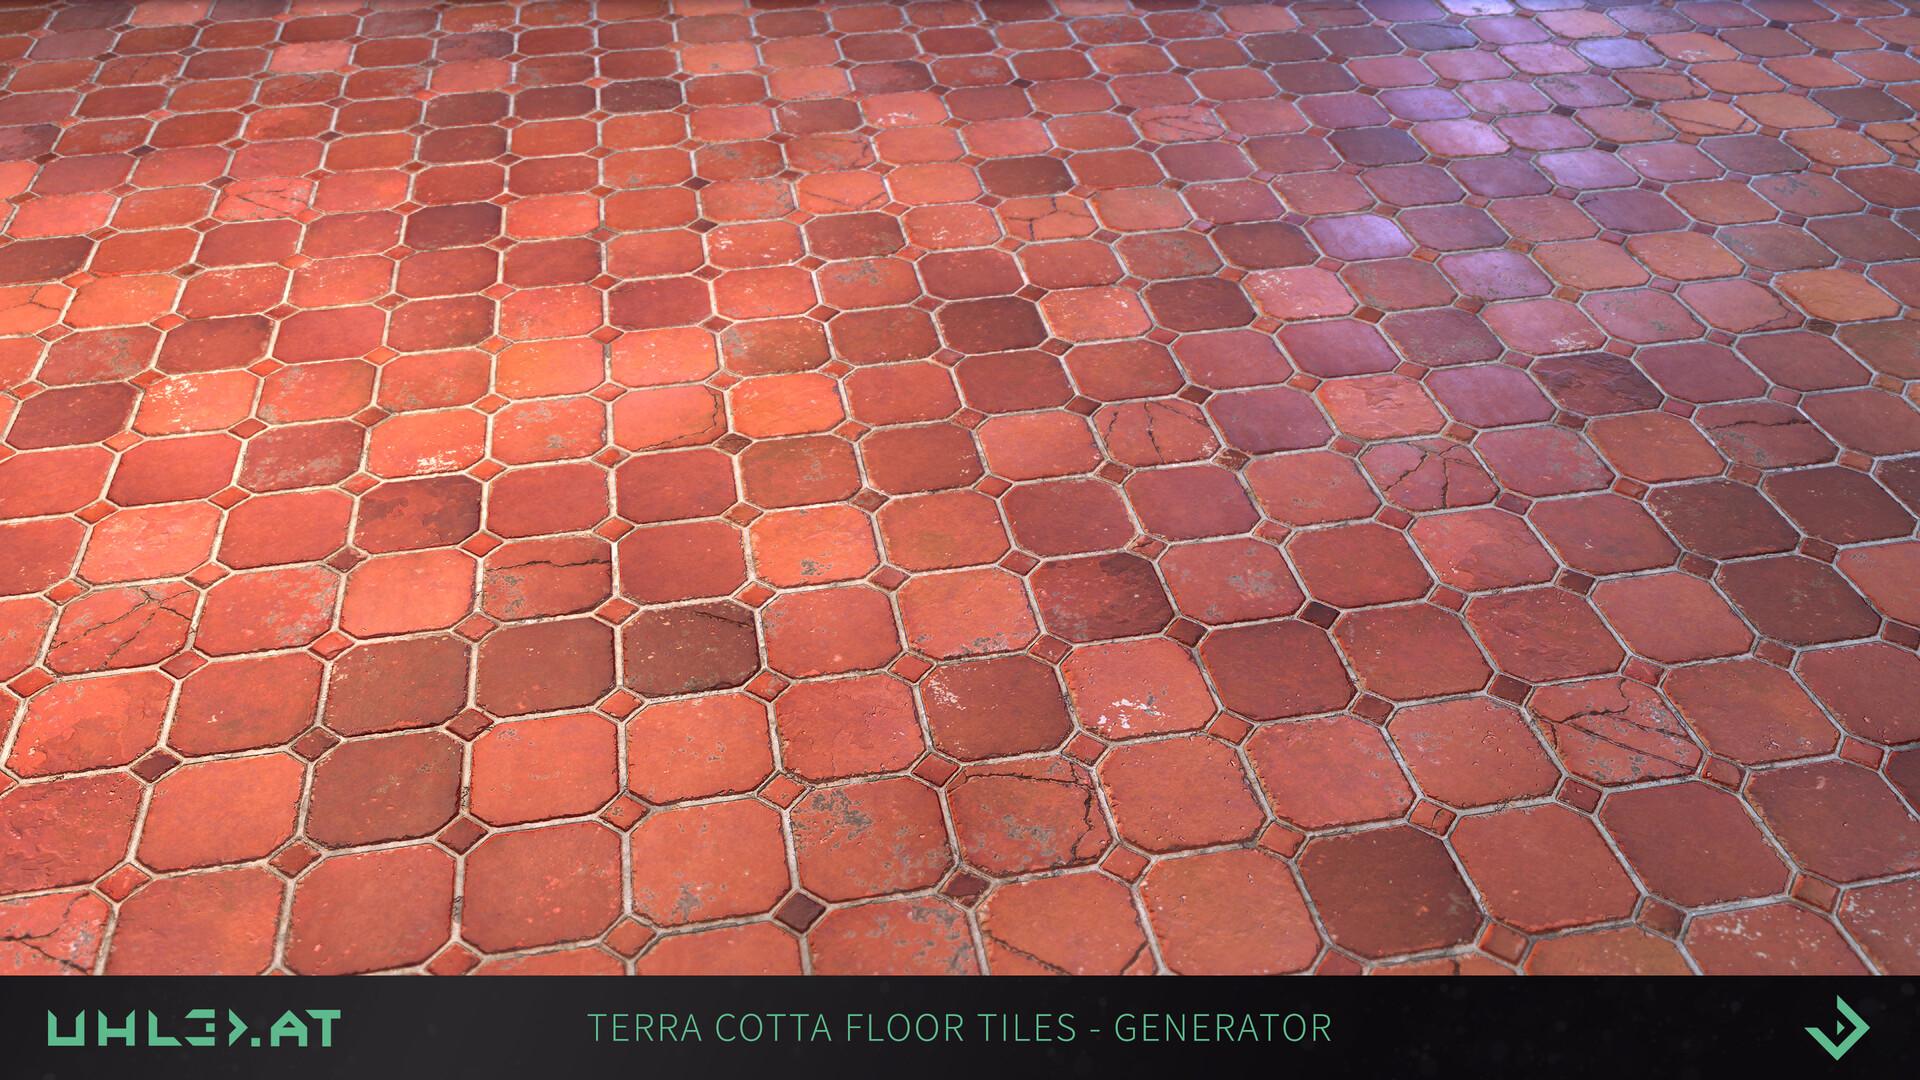 Dominik uhl terracottafloor generator detail 01